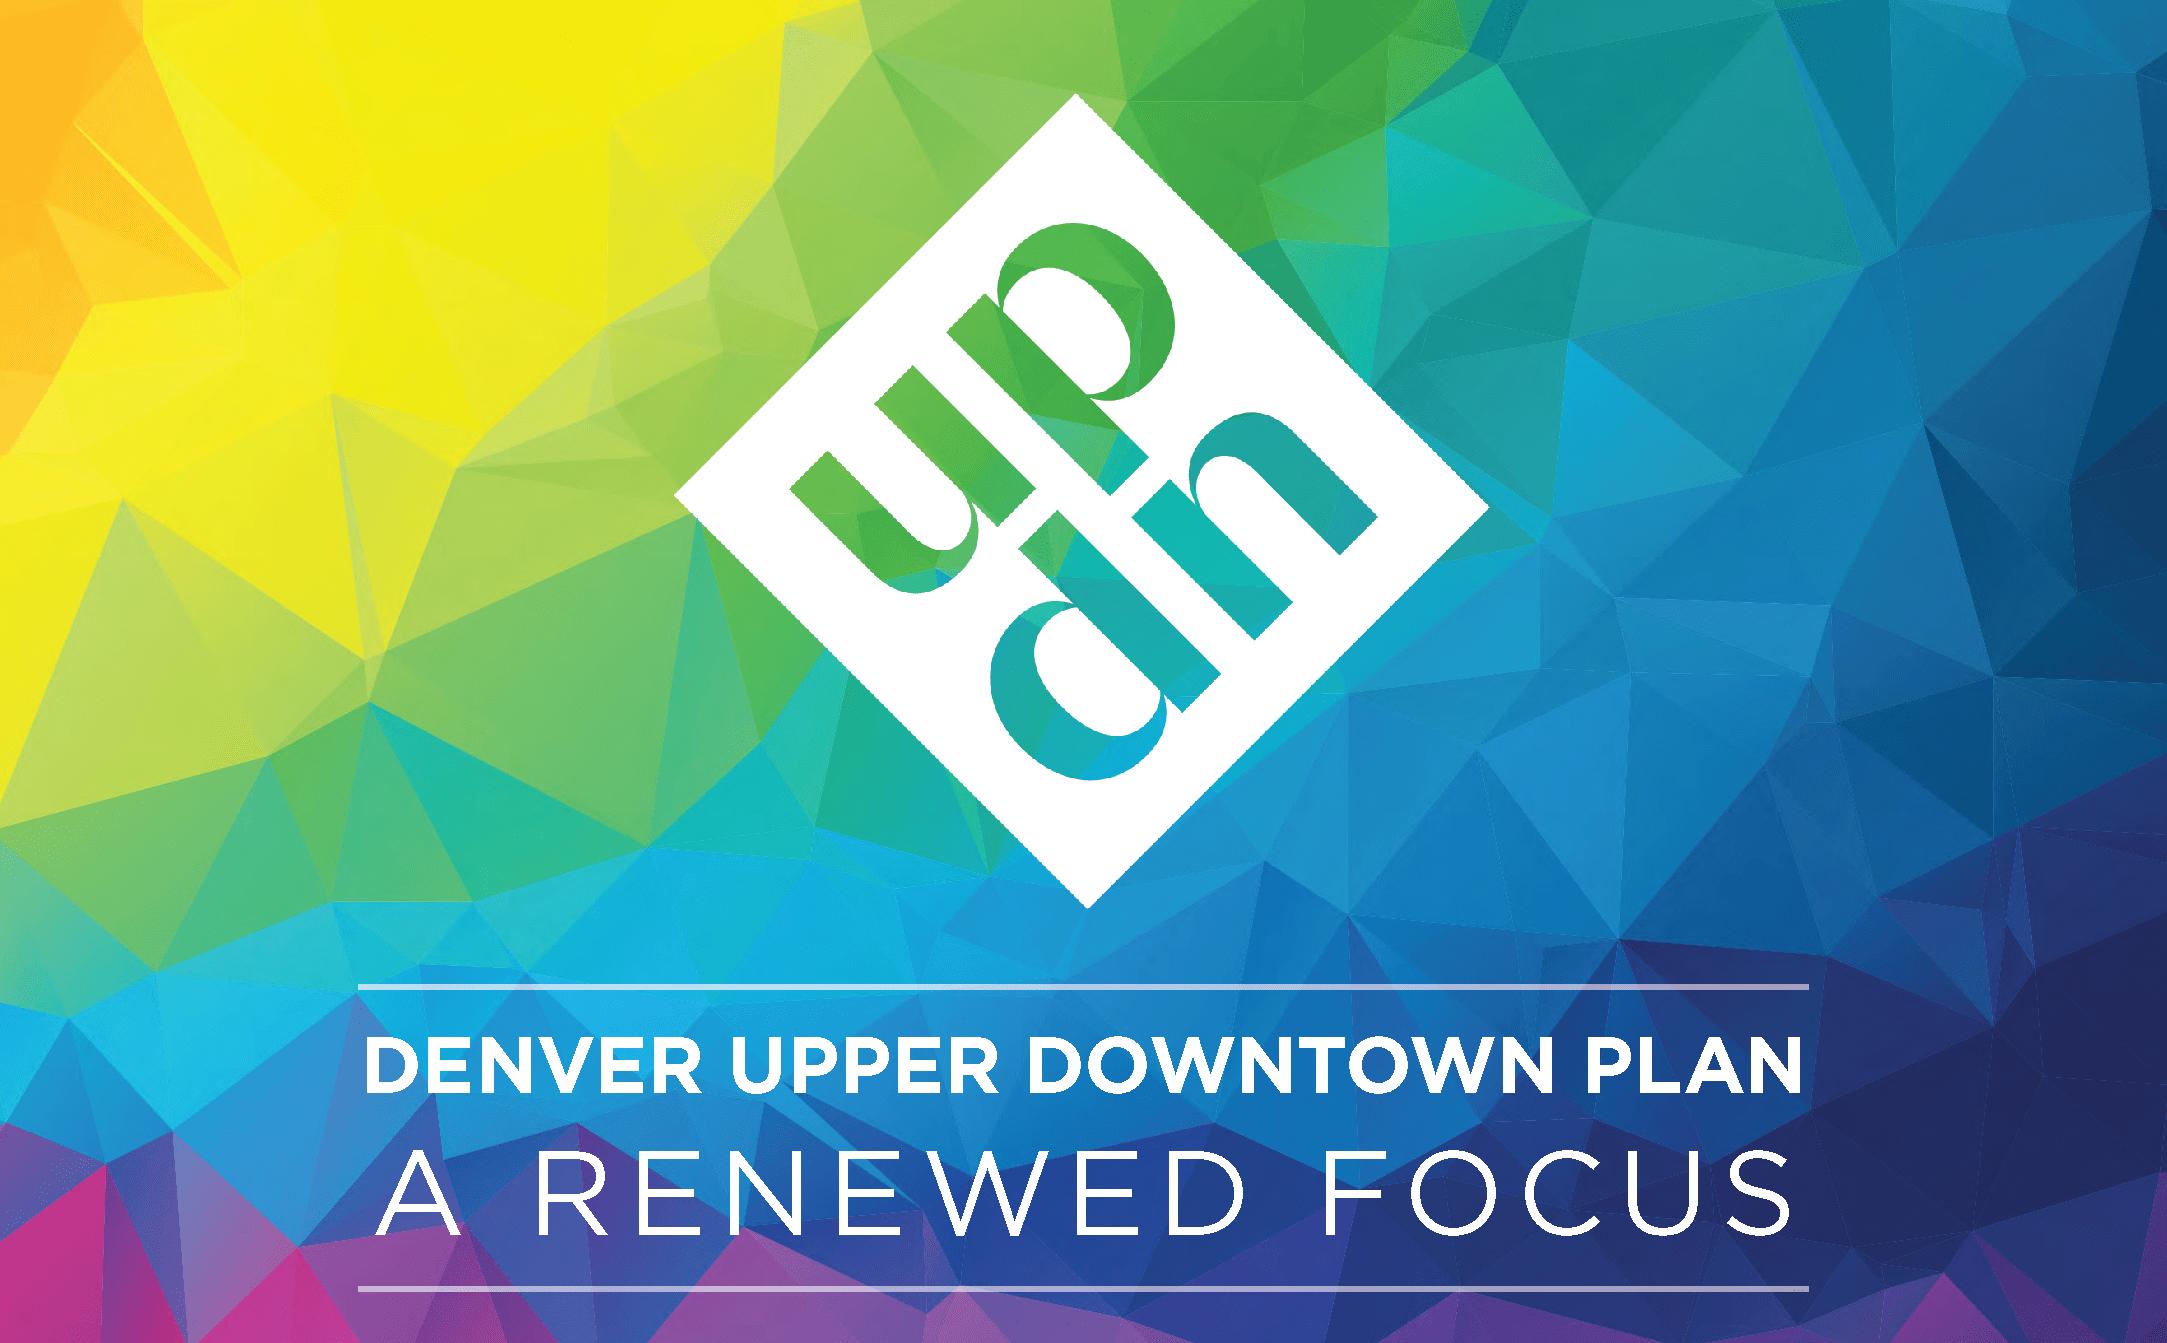 Denver Upper Downtown Plan